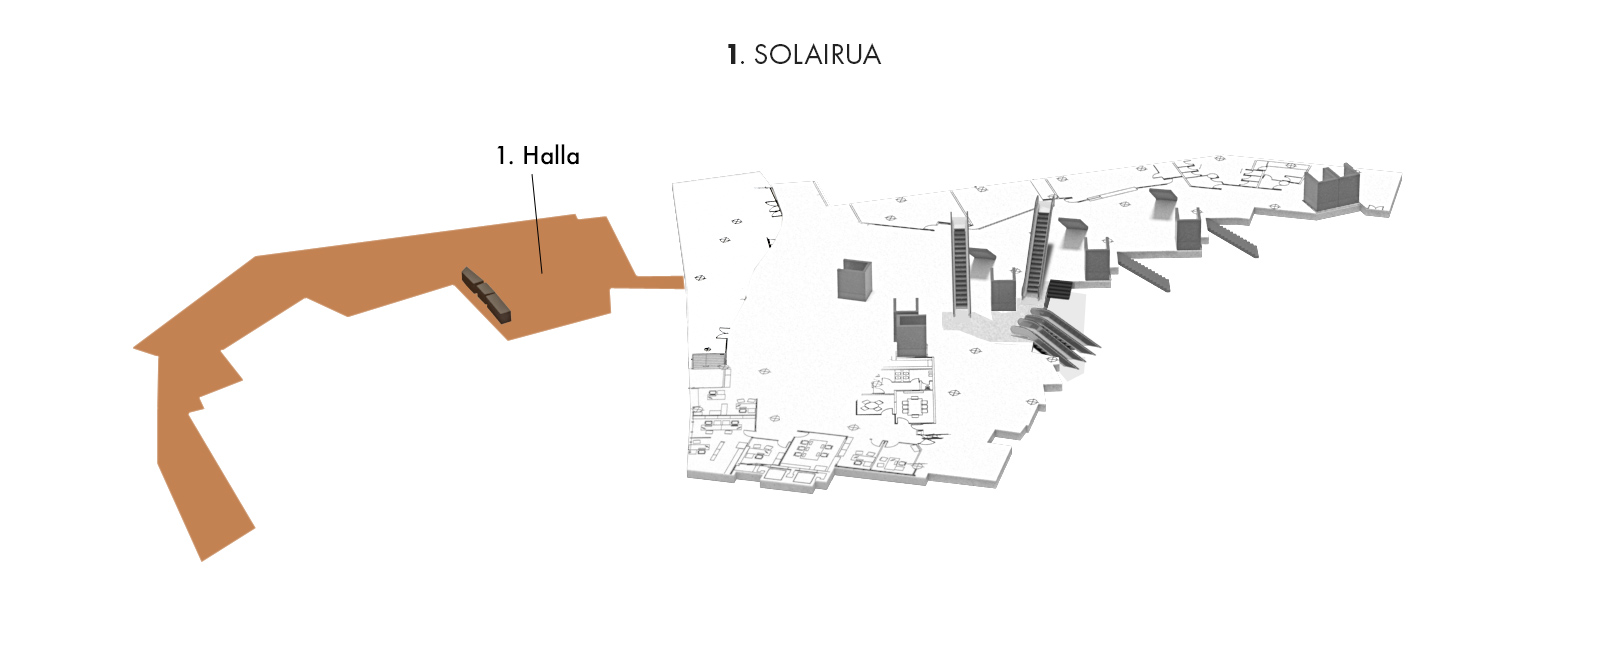 1 Halla, 1. solairua | Palacio Euskalduna Jauregia